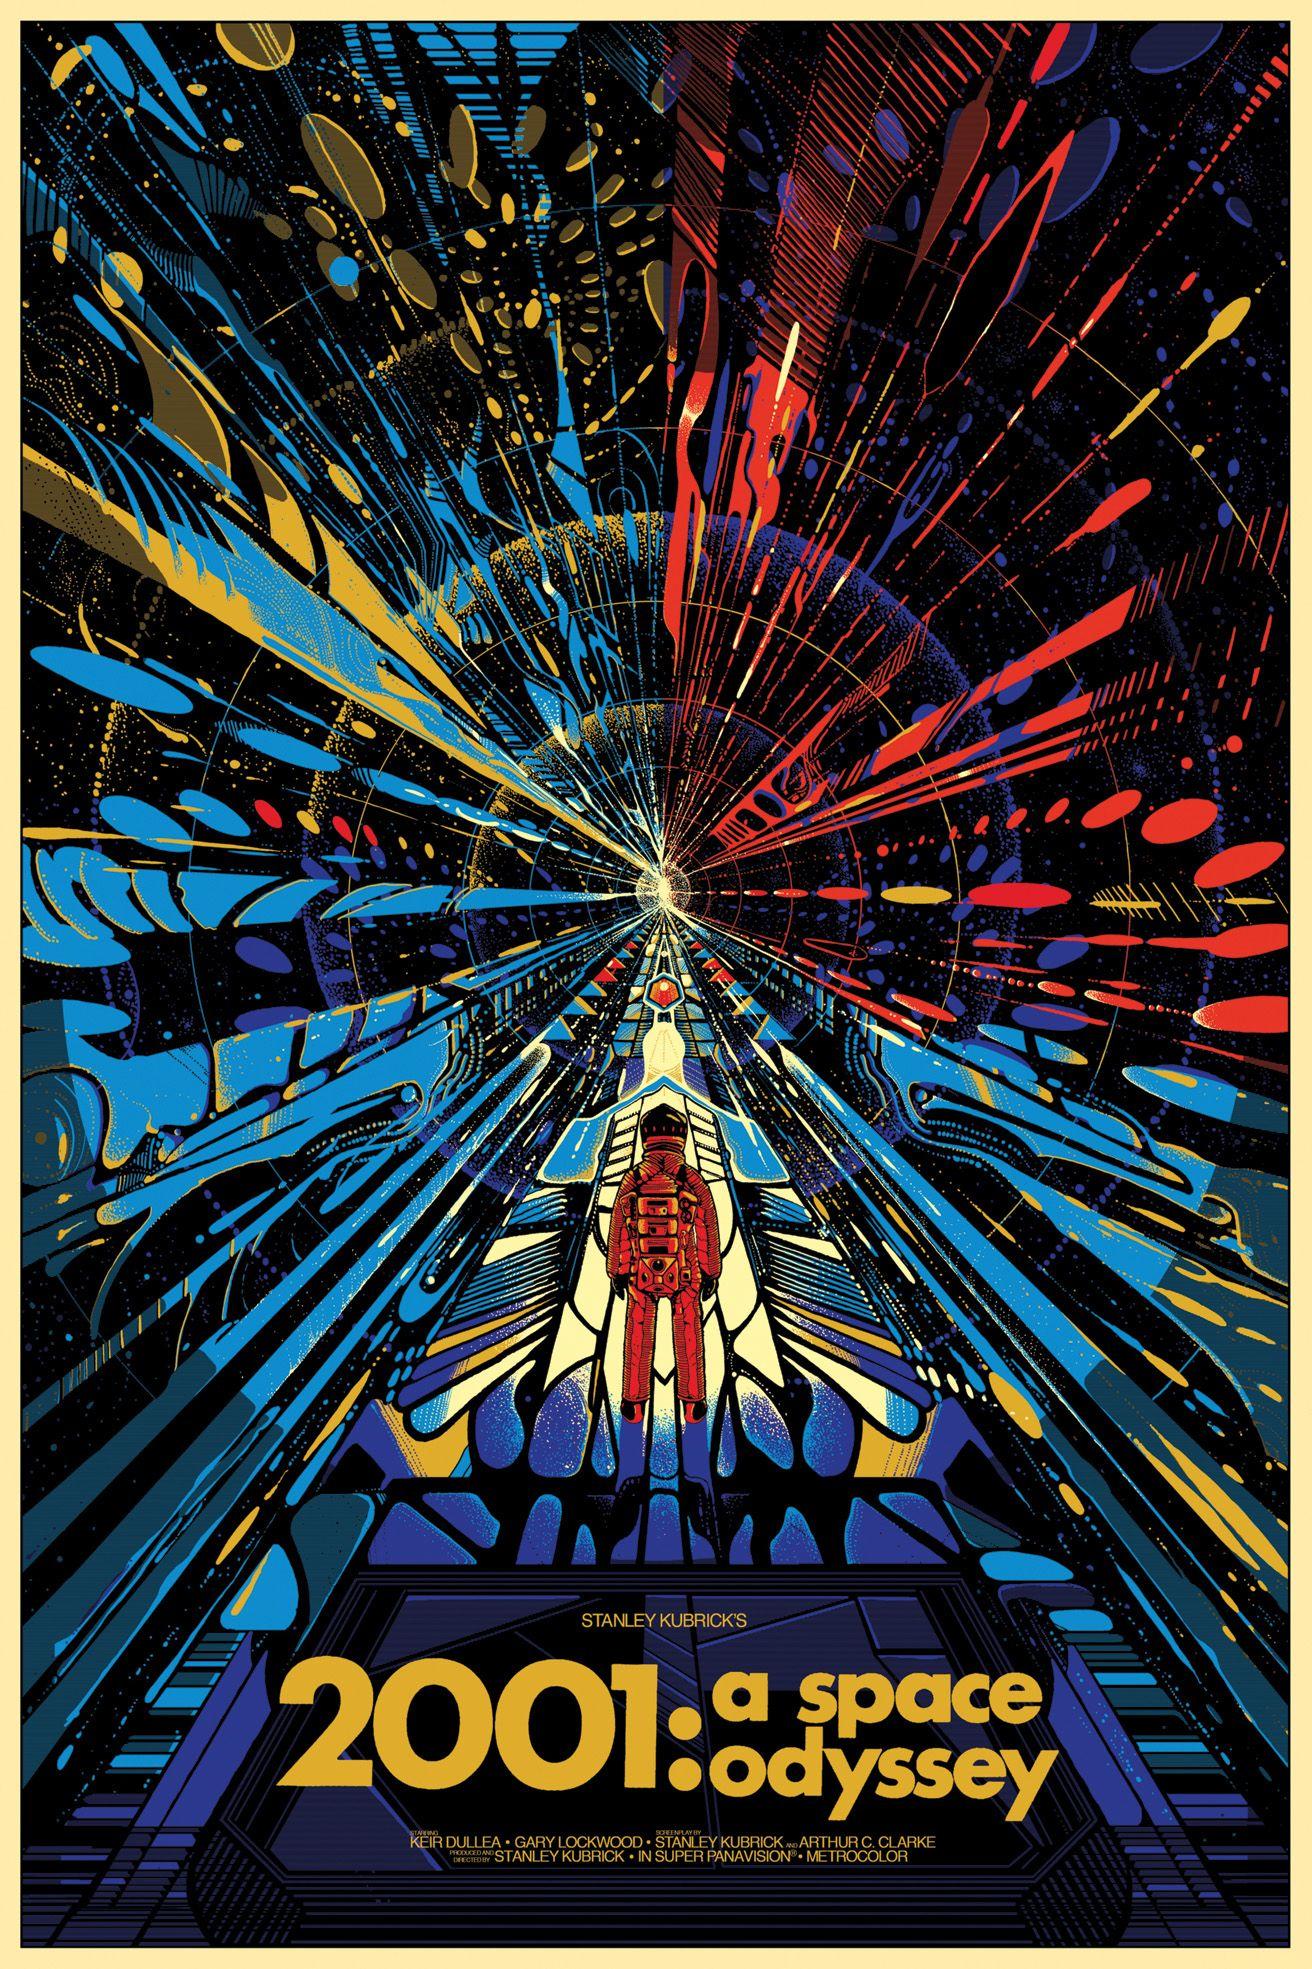 Movie Art Poster Fan Art Movie Print 2001 A Space Odyssey Cult Classic